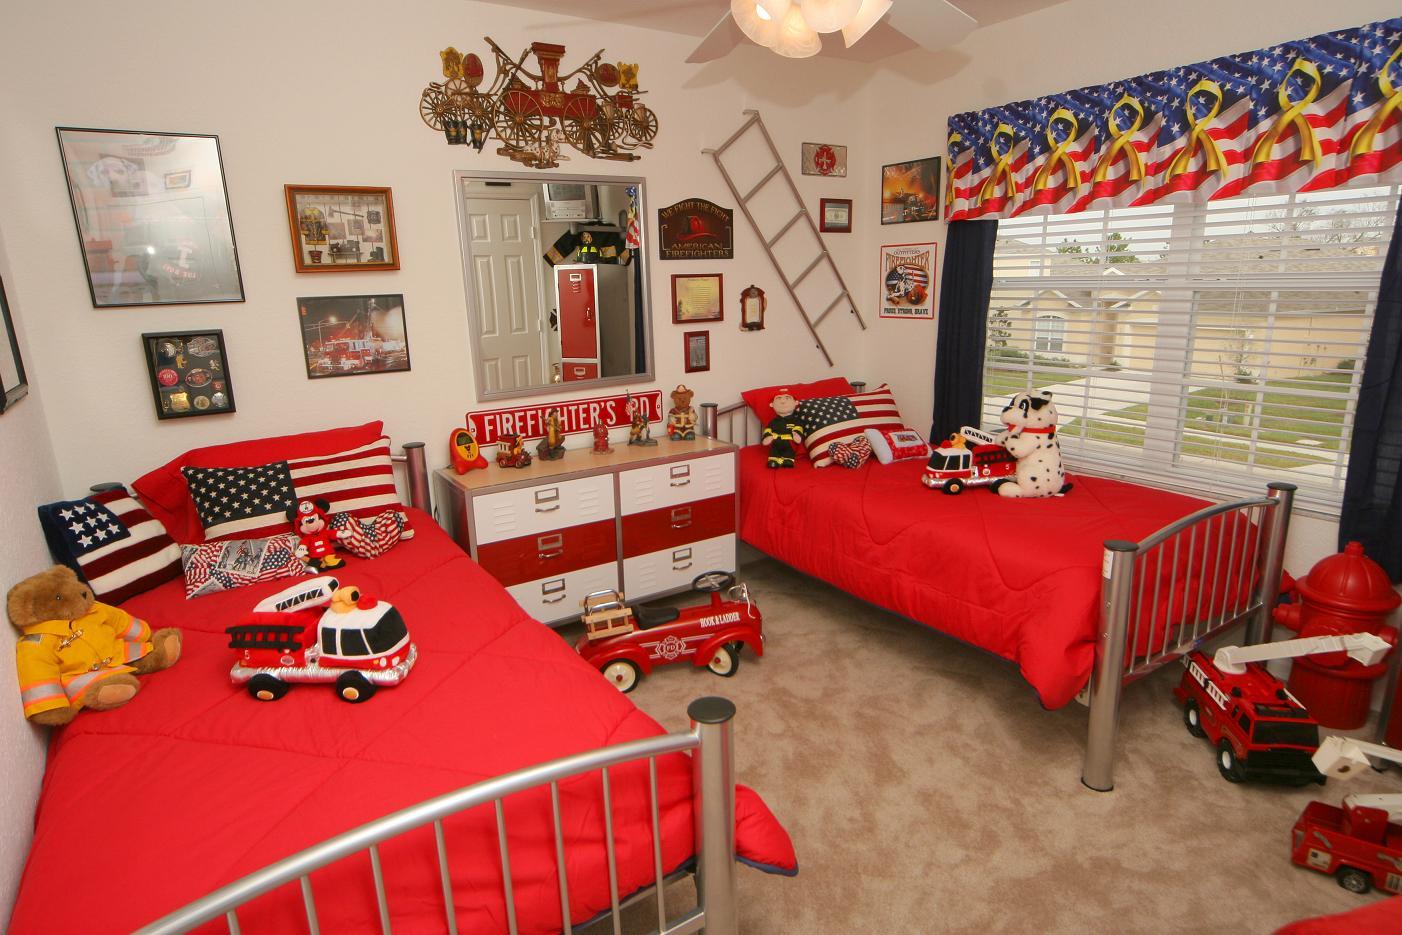 Firefighter Kids Room goleador for Accomodations Firefighter Kids Room  Firefighter Room Decor Modern Home  FirefighterFirefighter Bedroom Decor   kts s com. Firefighter Room Decorations. Home Design Ideas